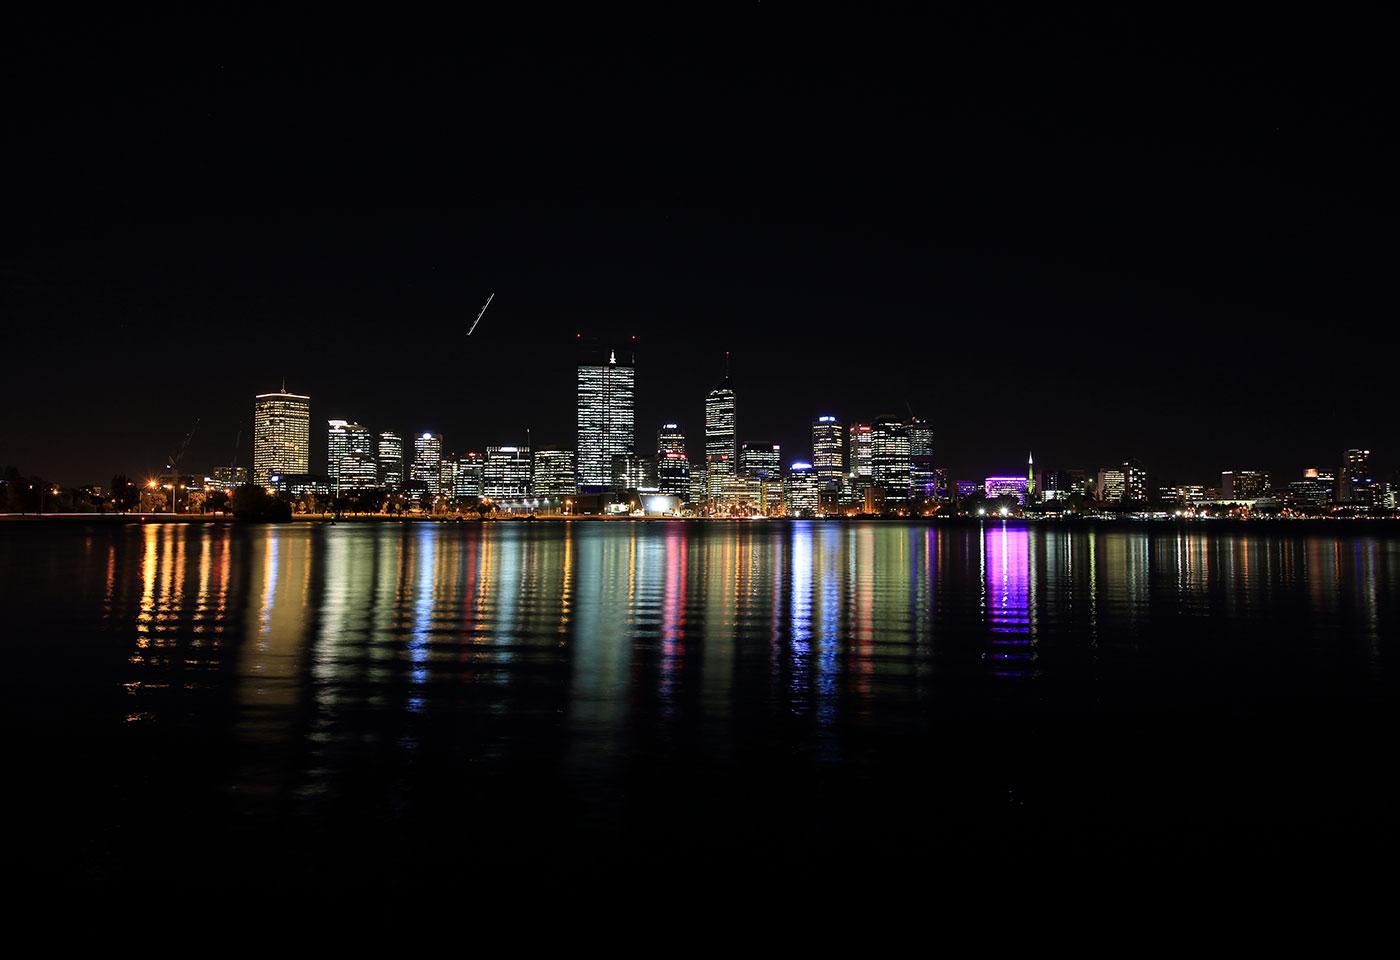 Perth by Night by Steve Huddy